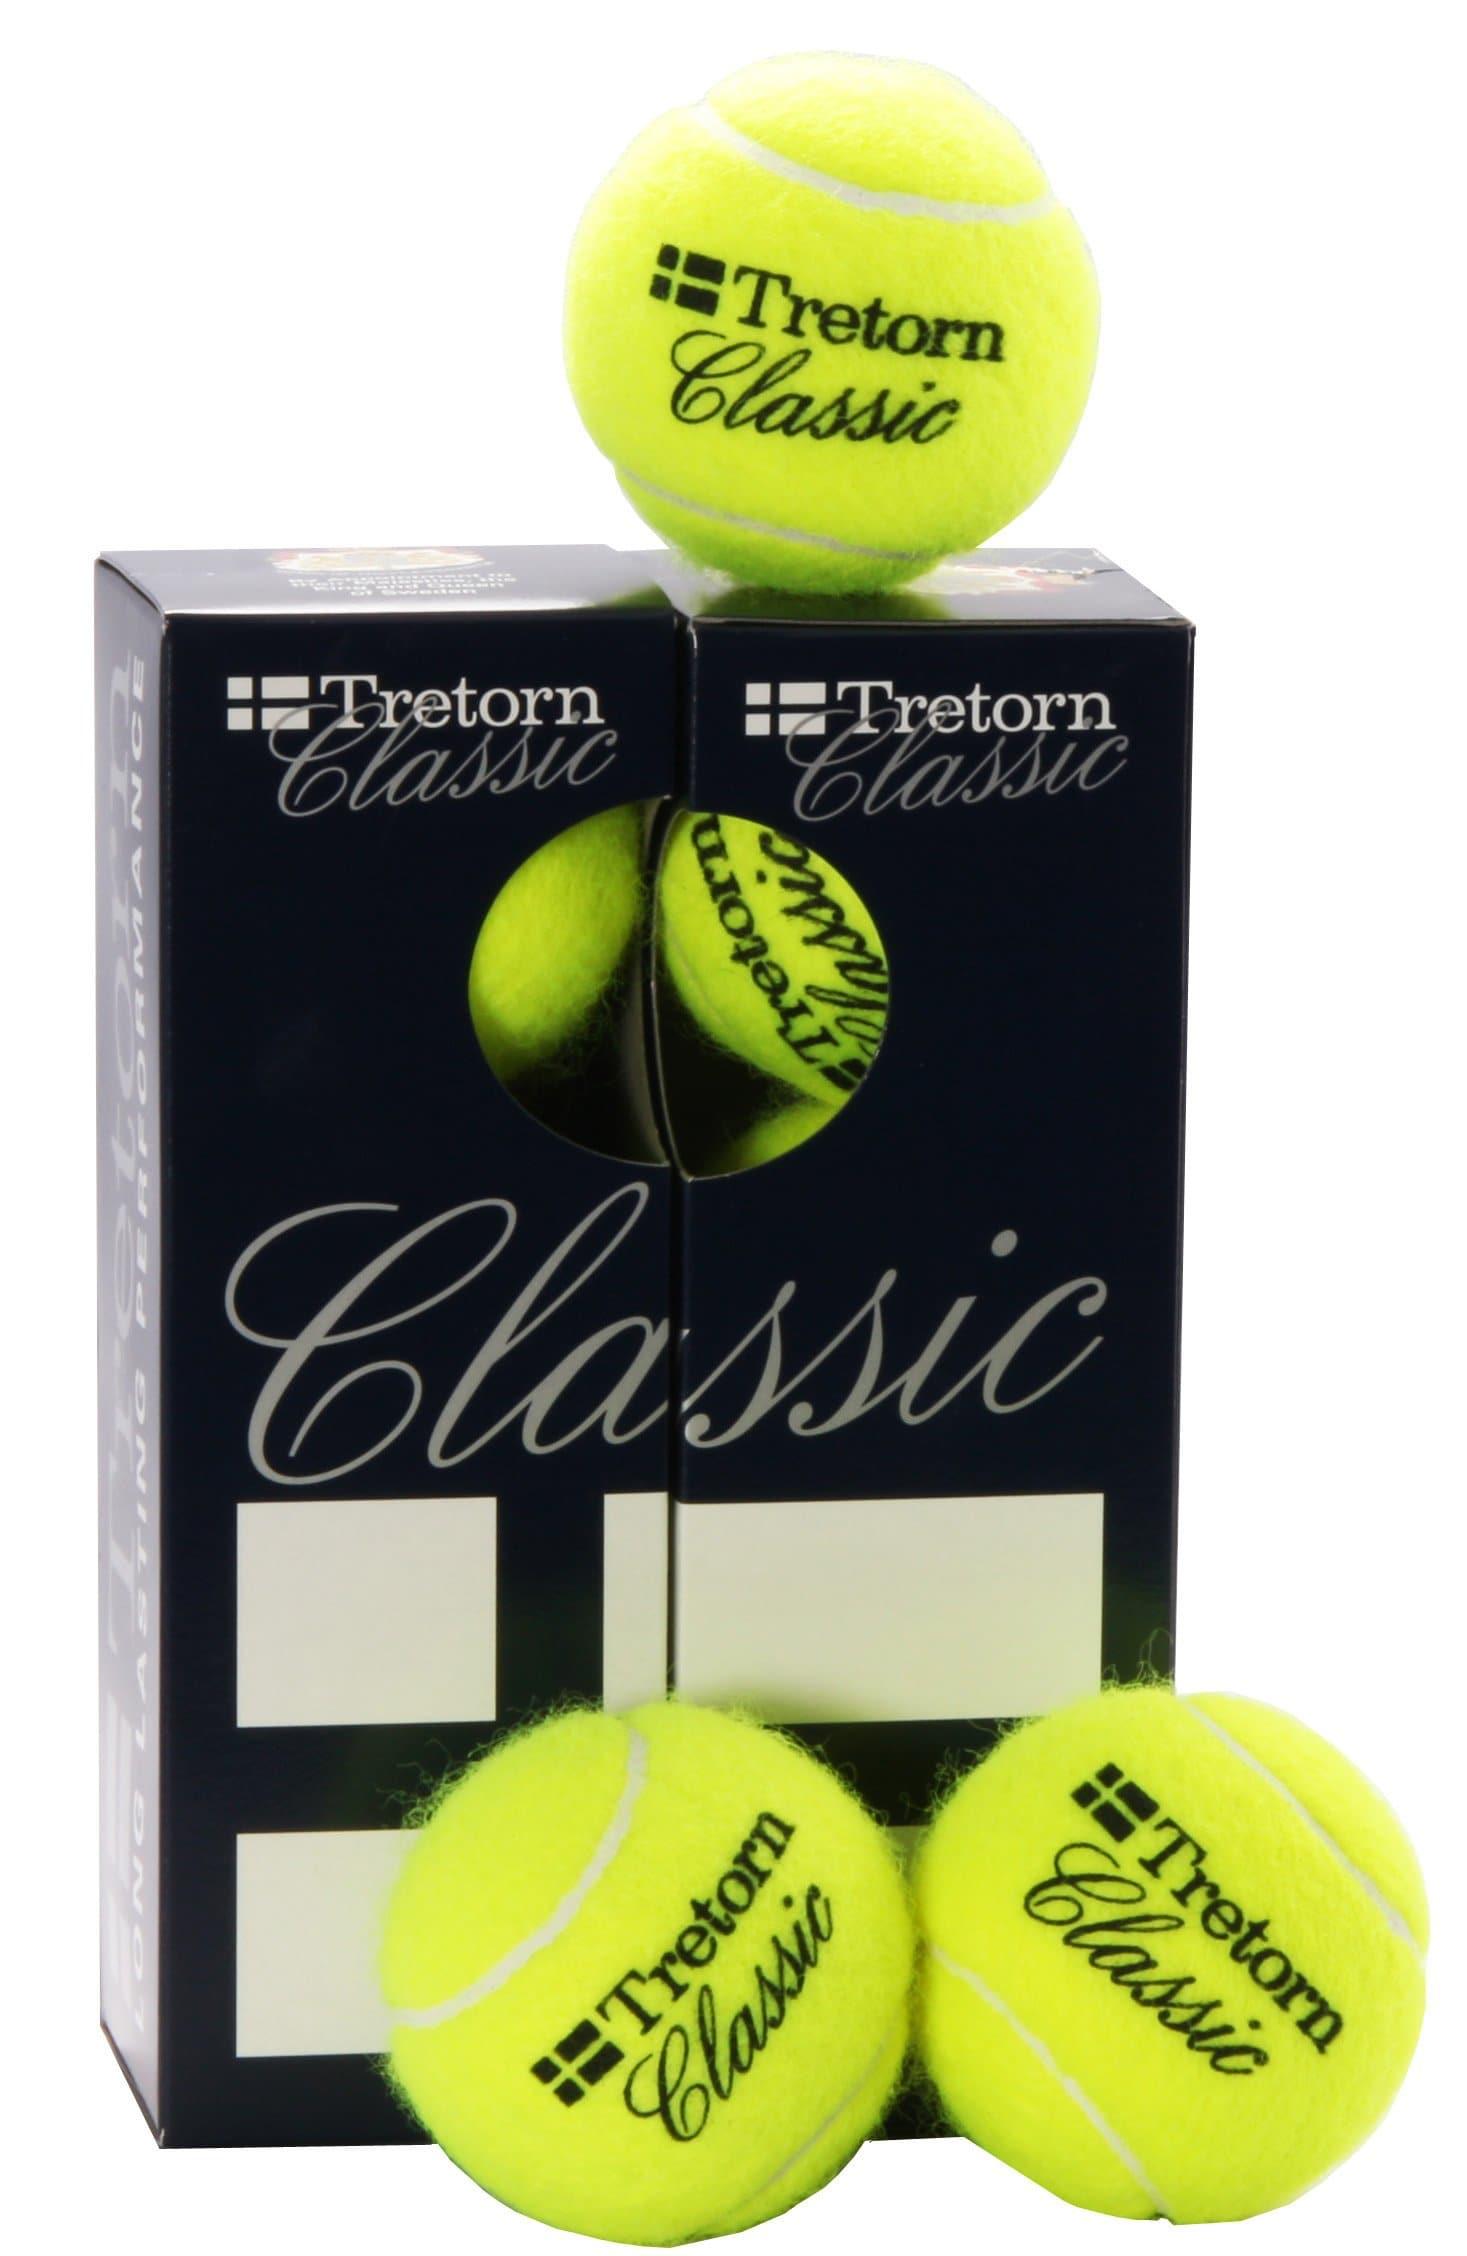 Tretorn Classic (6er Karton) Tennisball